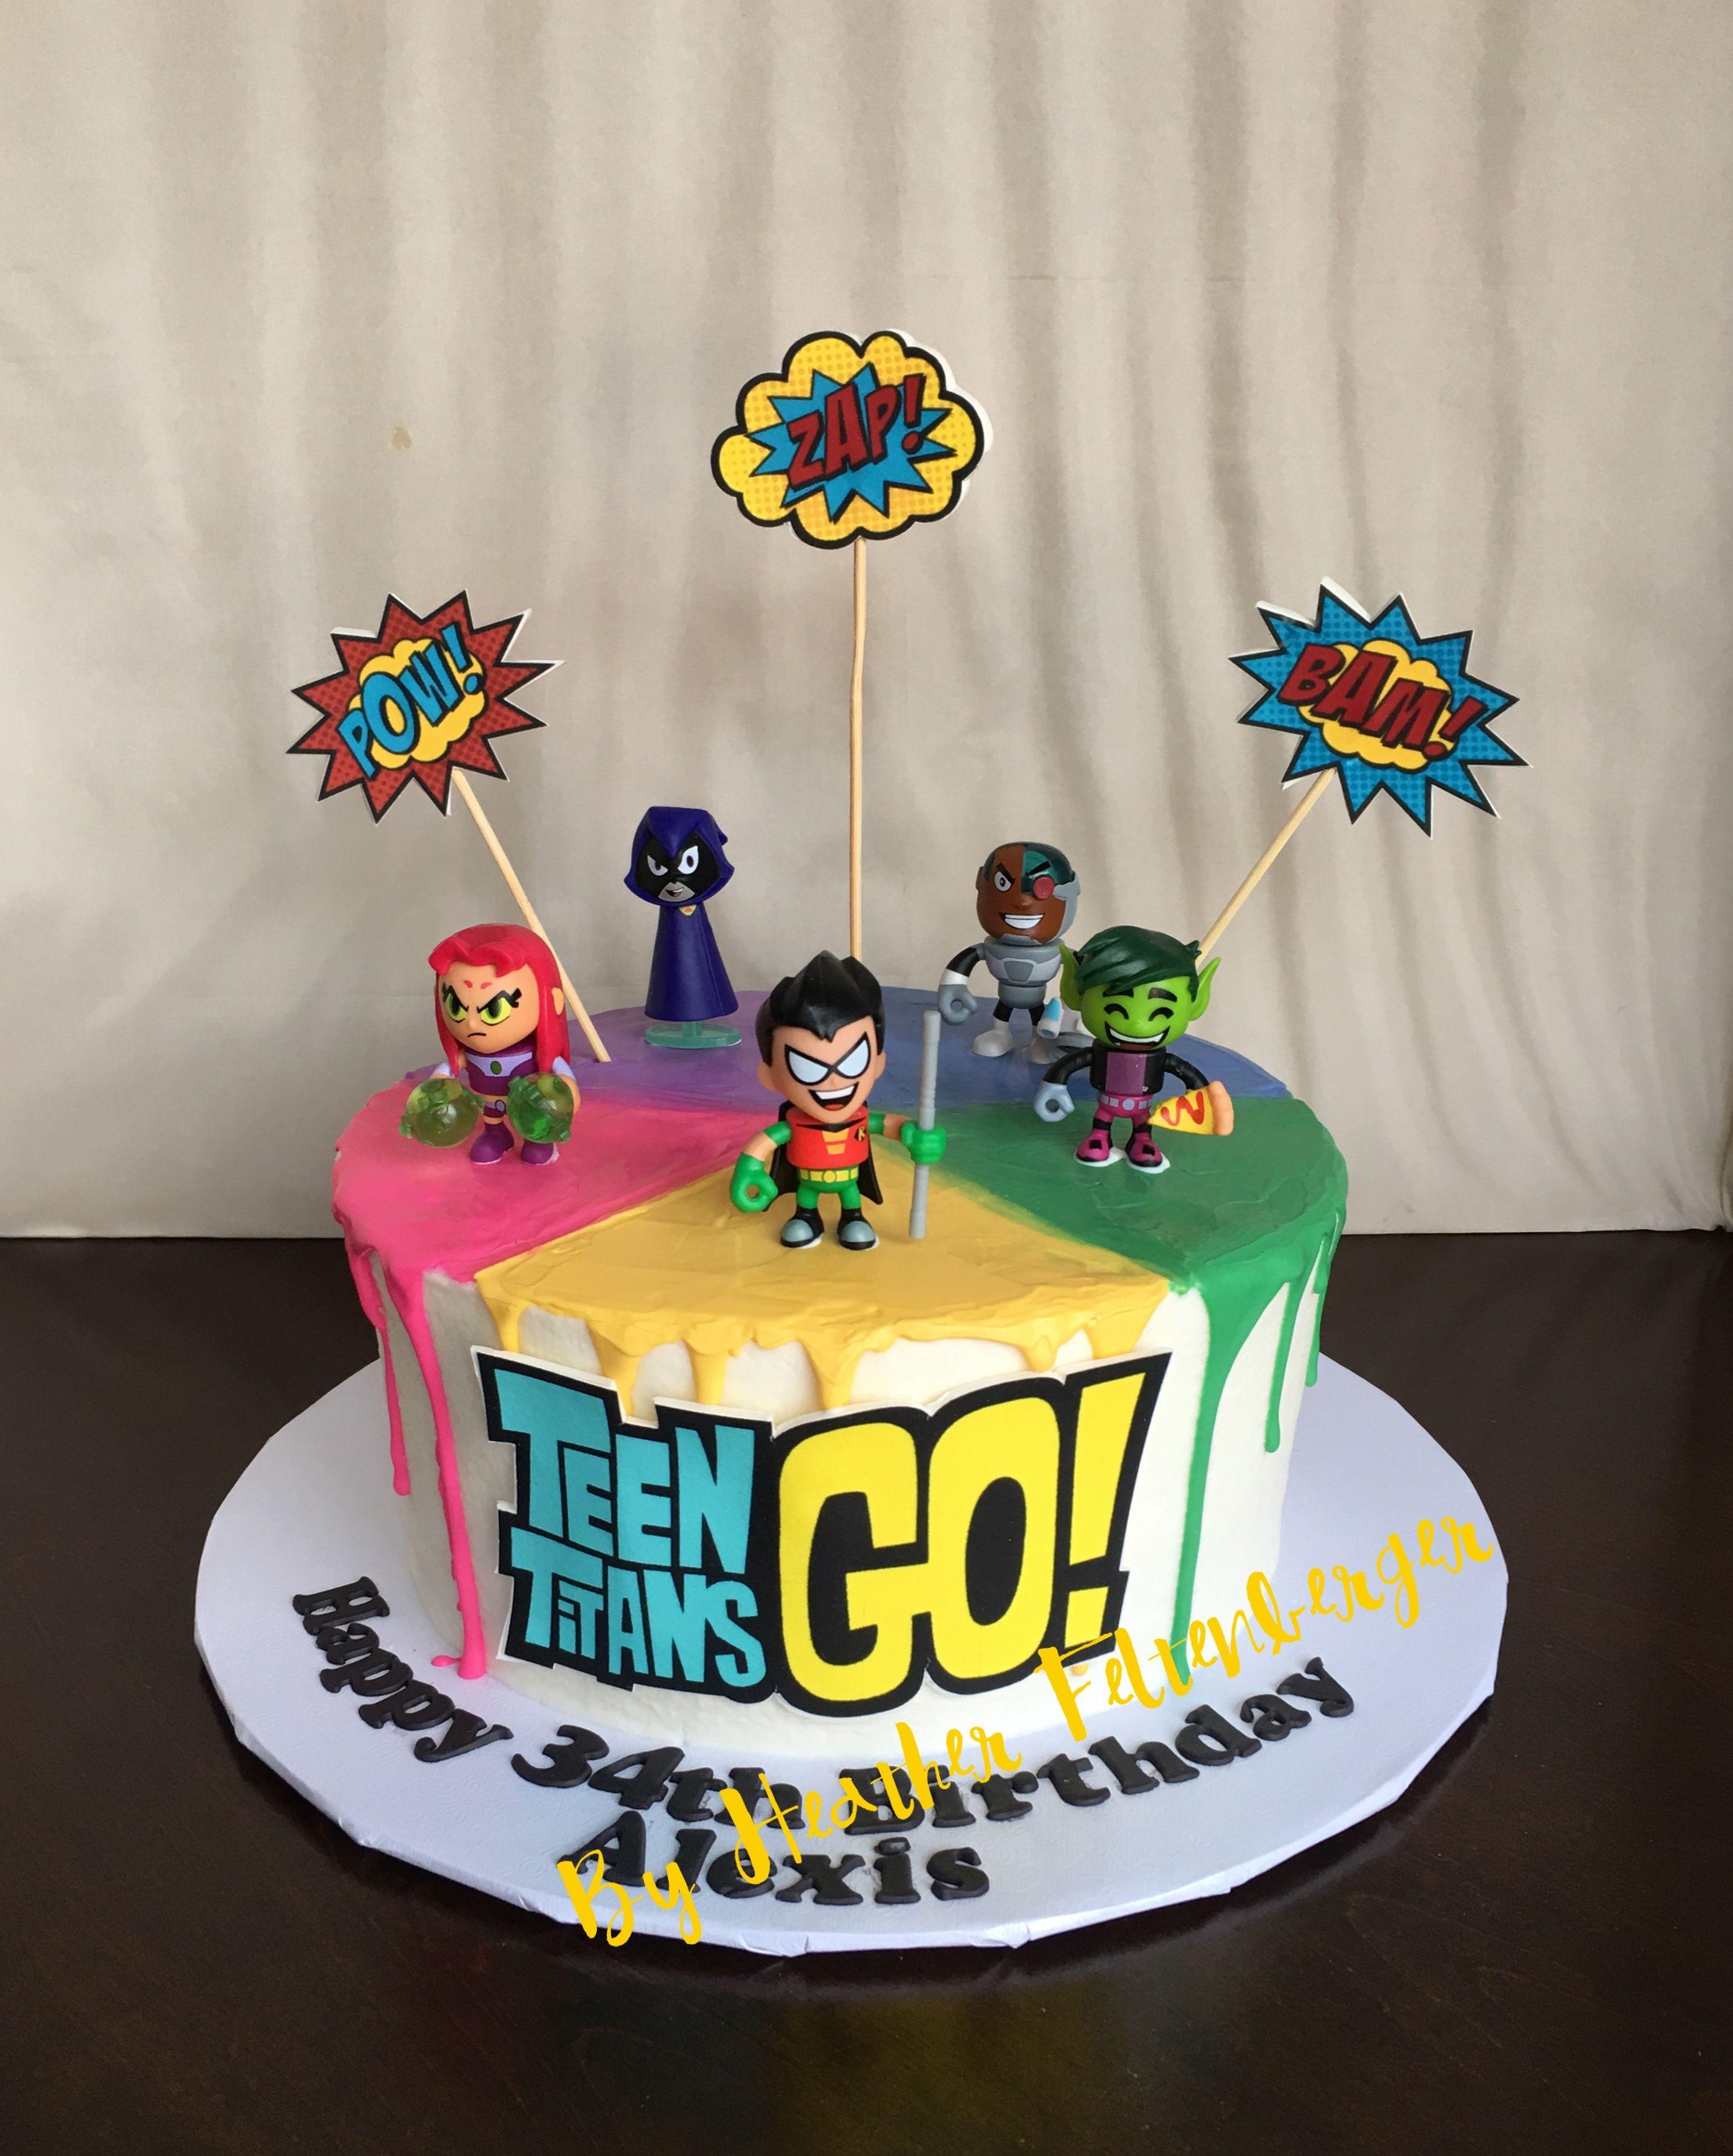 Teen Titans Go! Birthday cake | My Cakes en 2019 | Fiesta niños ...